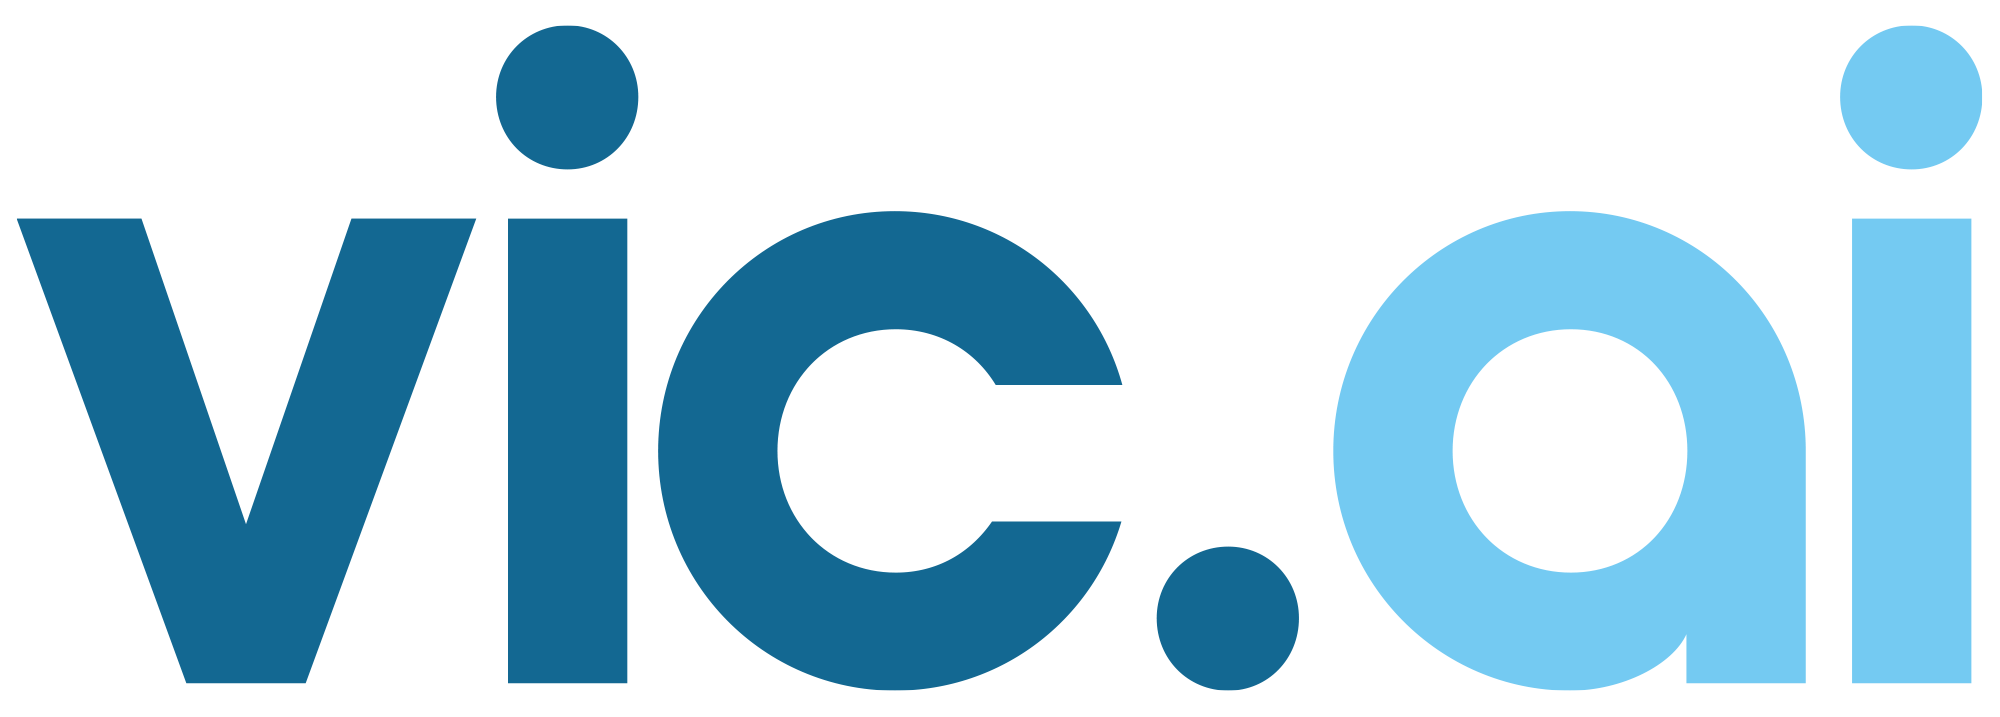 vic_logo_color